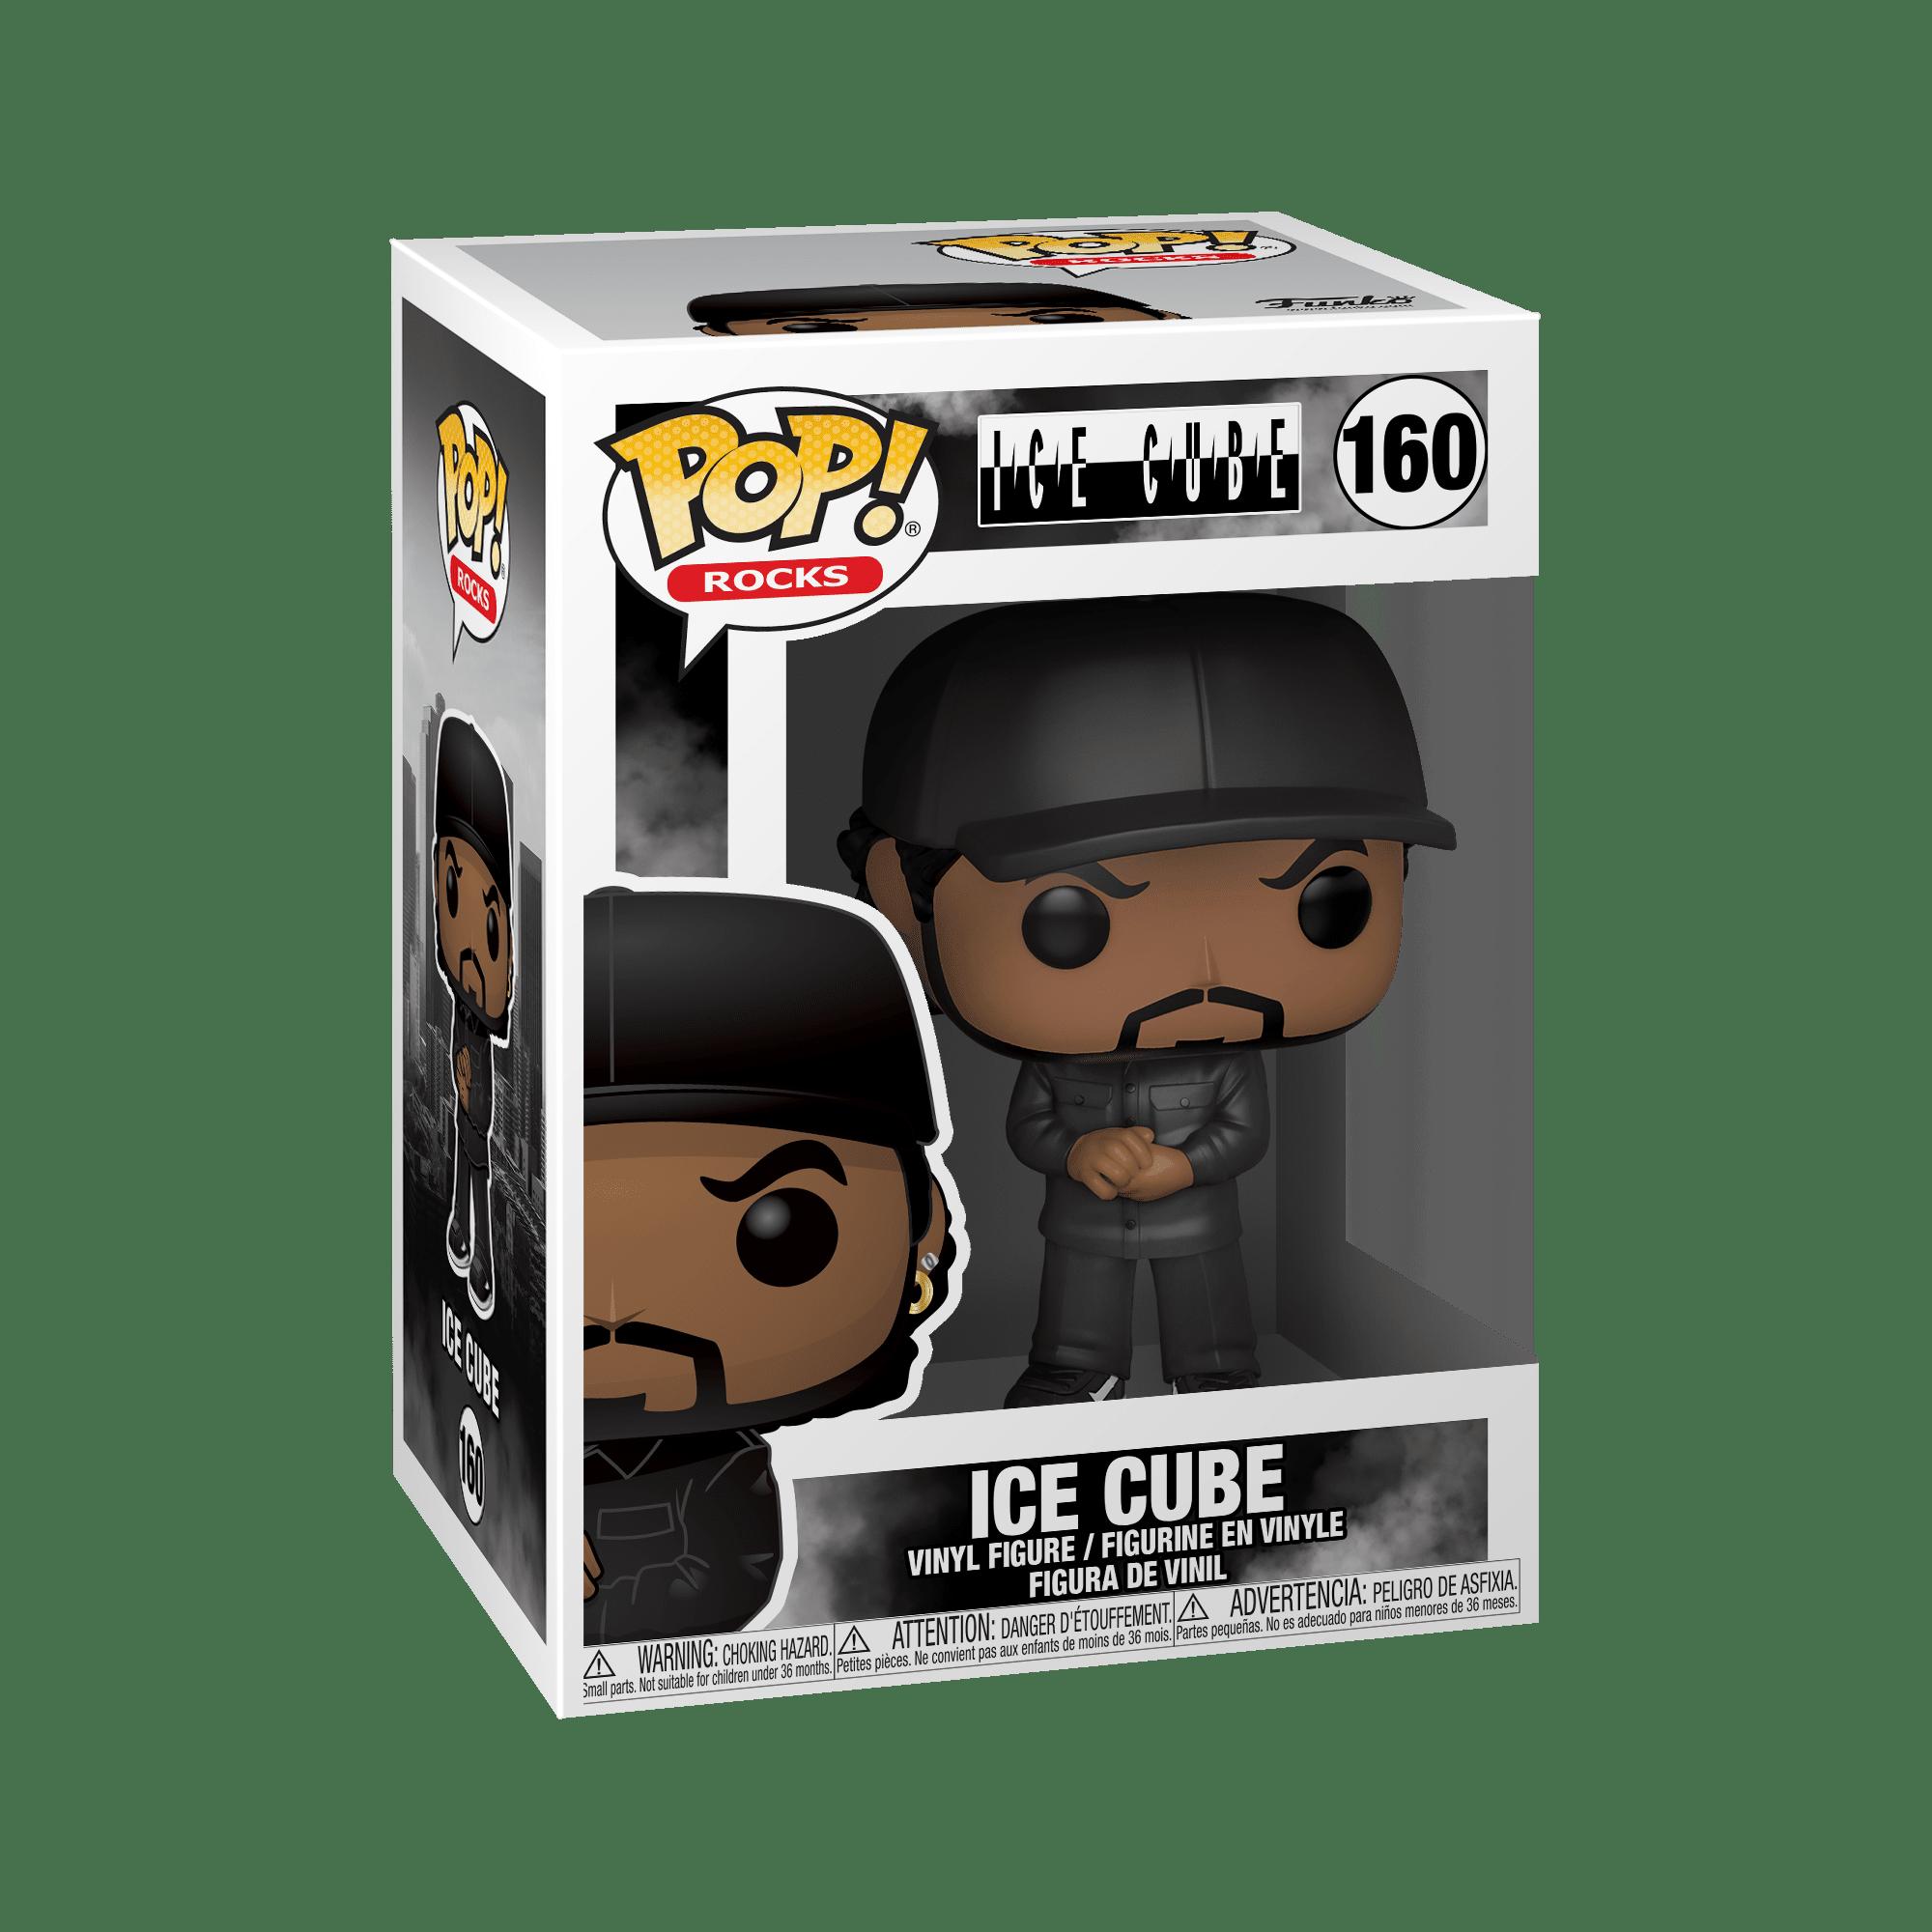 Funko Pop Rocks Ice Cube Hip Hop Rap Music 160 NWA Compton Straight outta